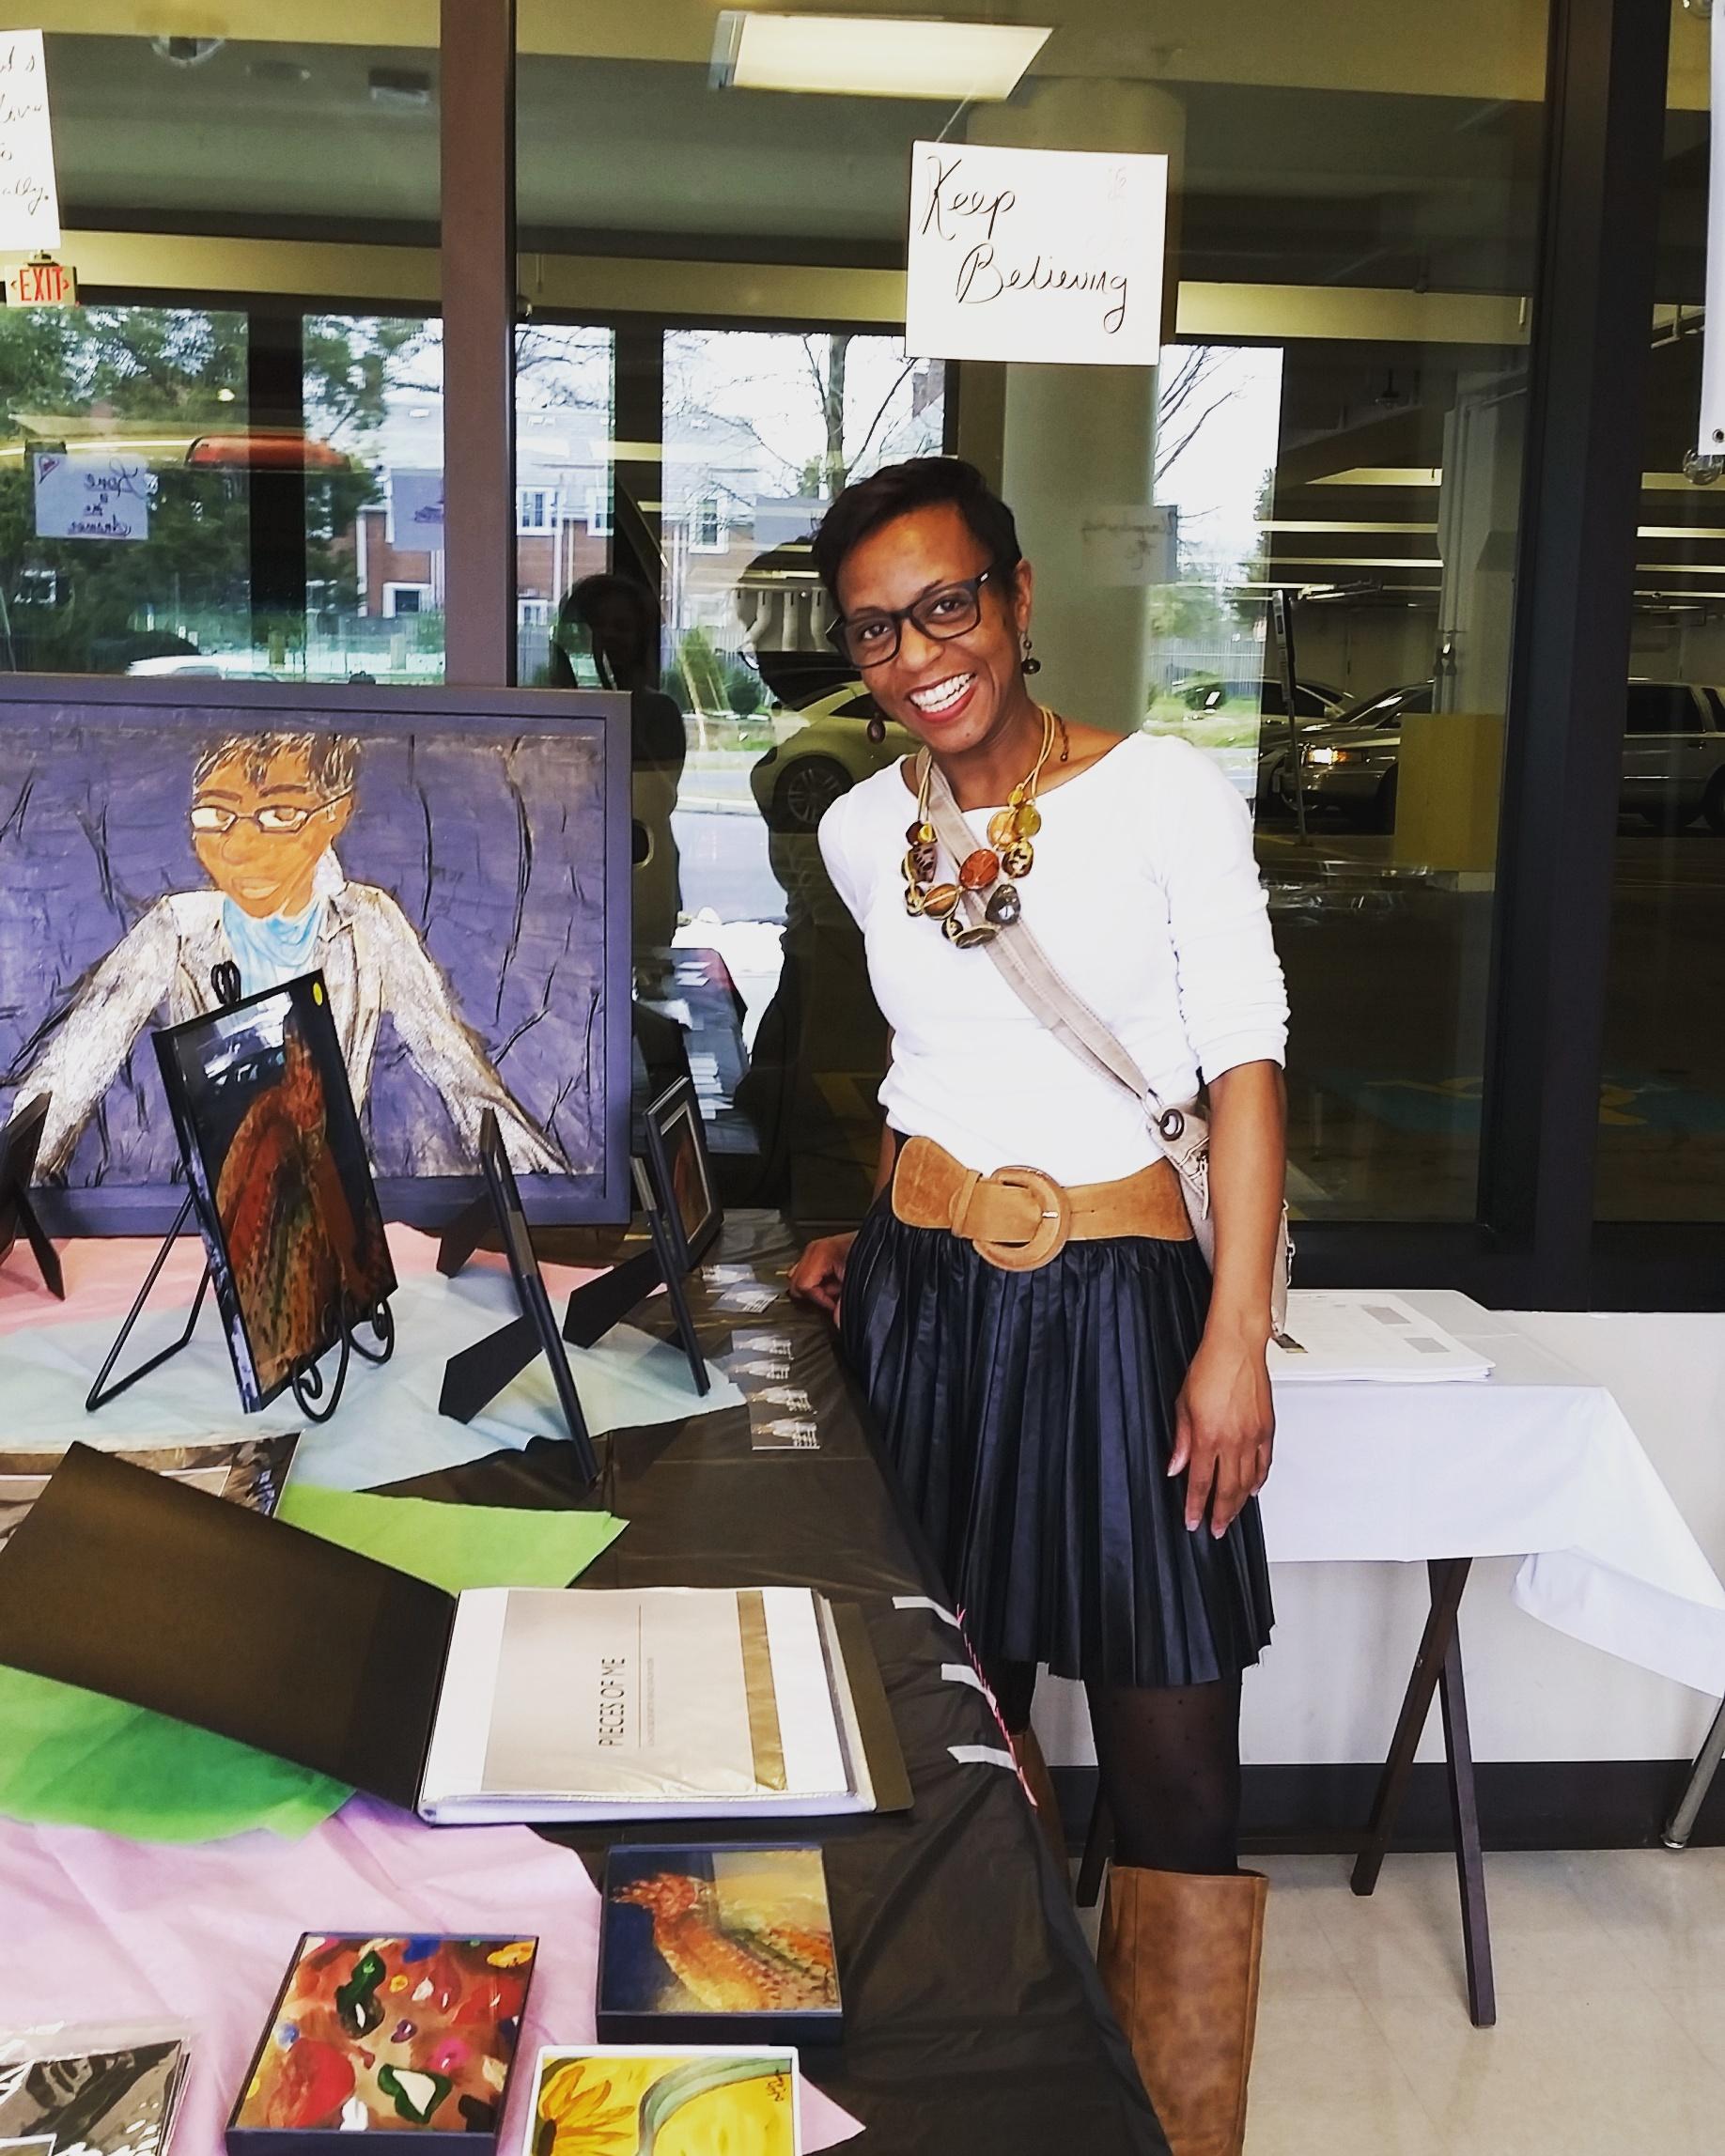 Ashley J. Moore Ellis - Educator, Writer, Artist, Workshop FacilitatorEmail: Ajmoore728@gmail.comInstagram: @piecesofajm